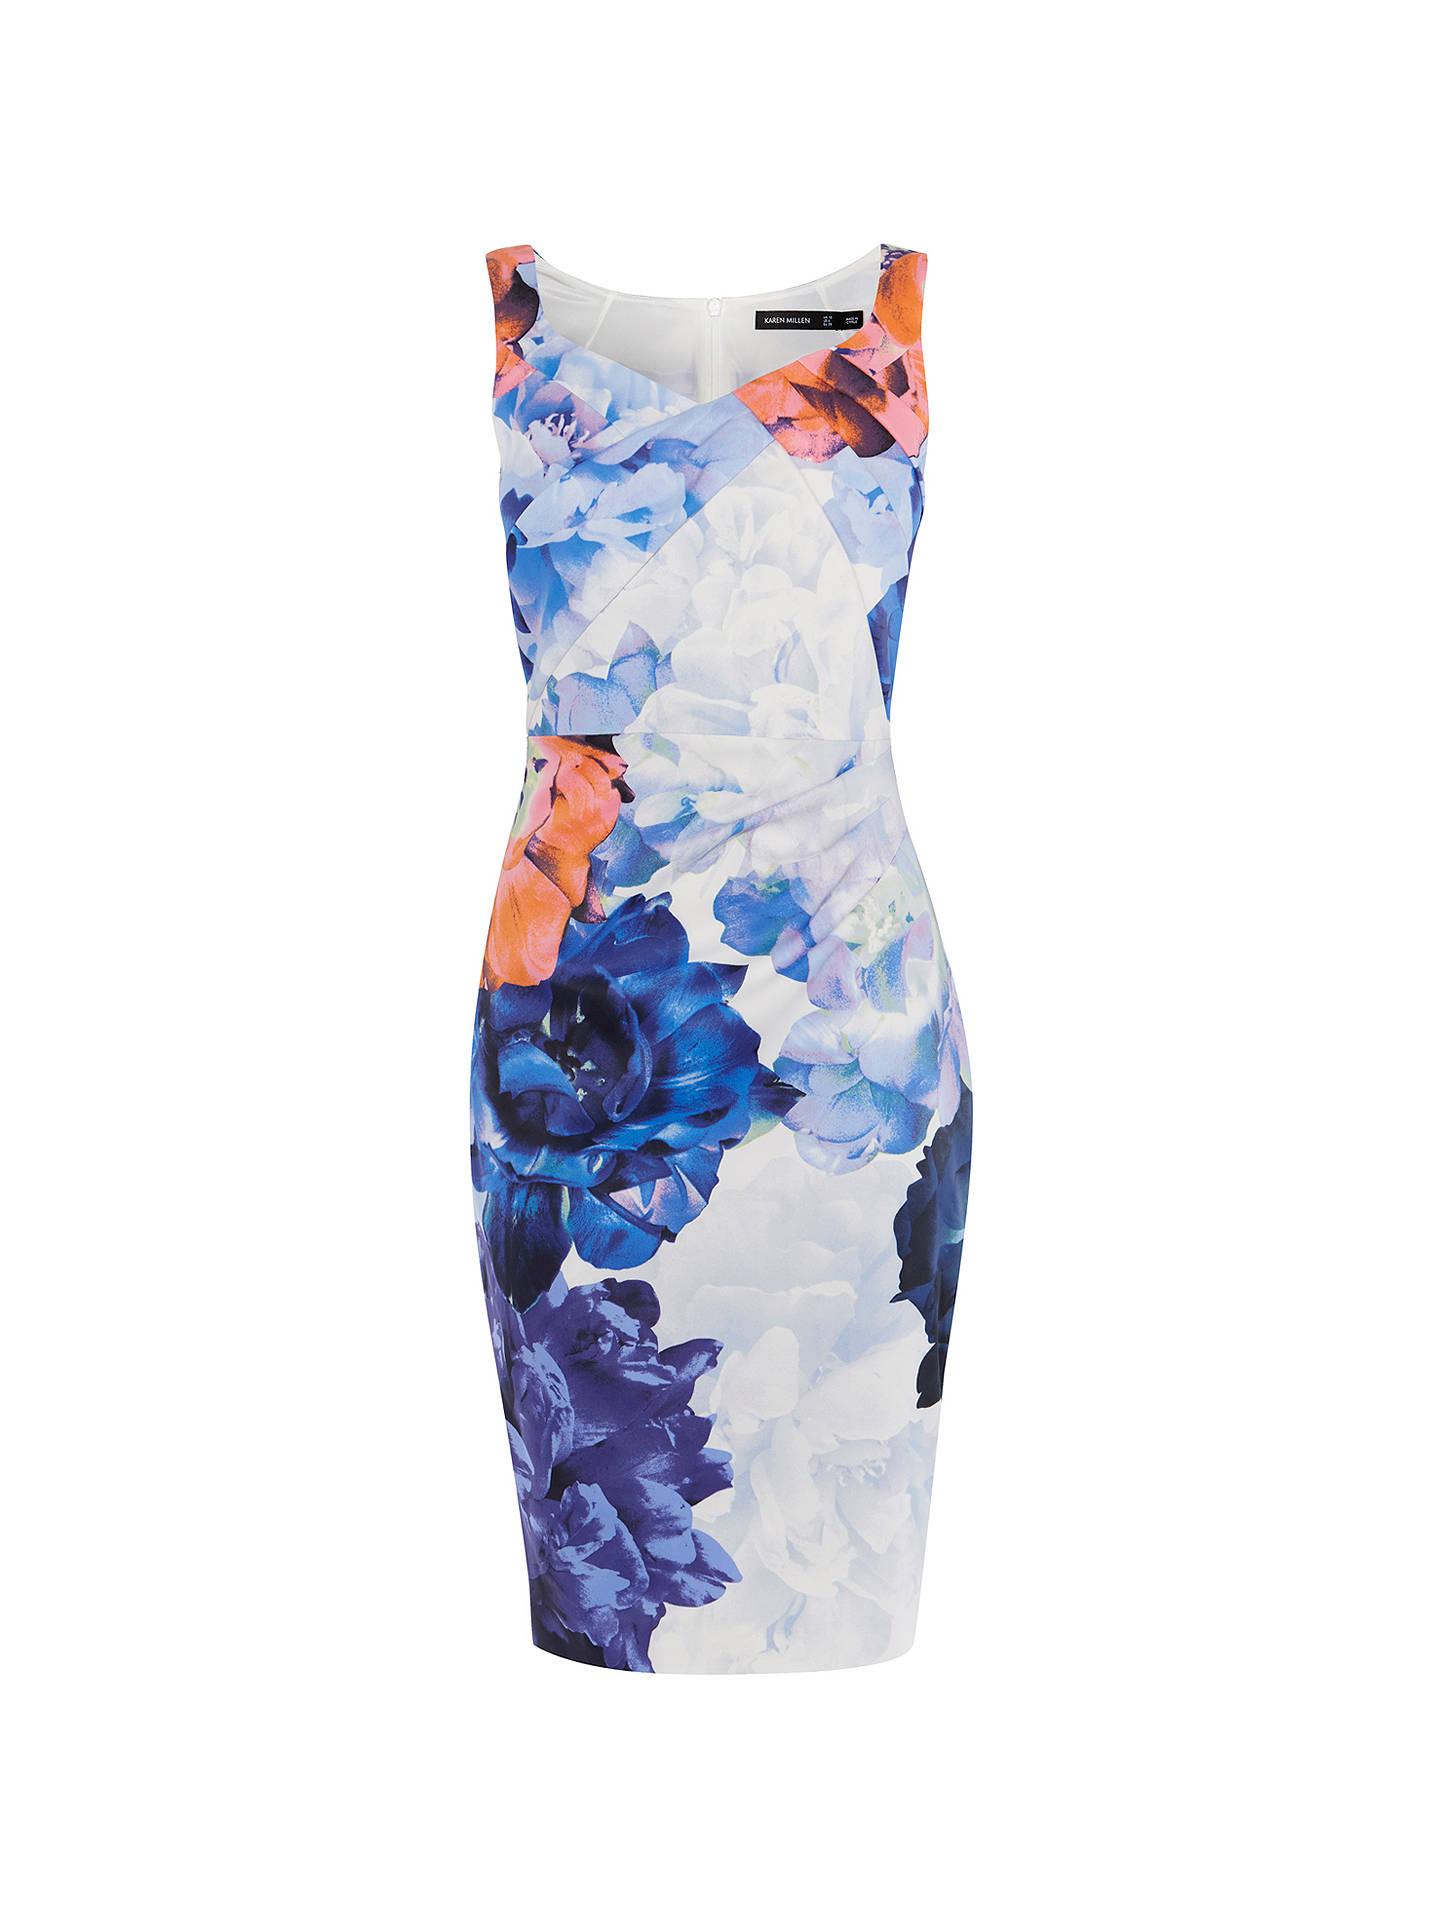 Karen Millen Floral Dresses